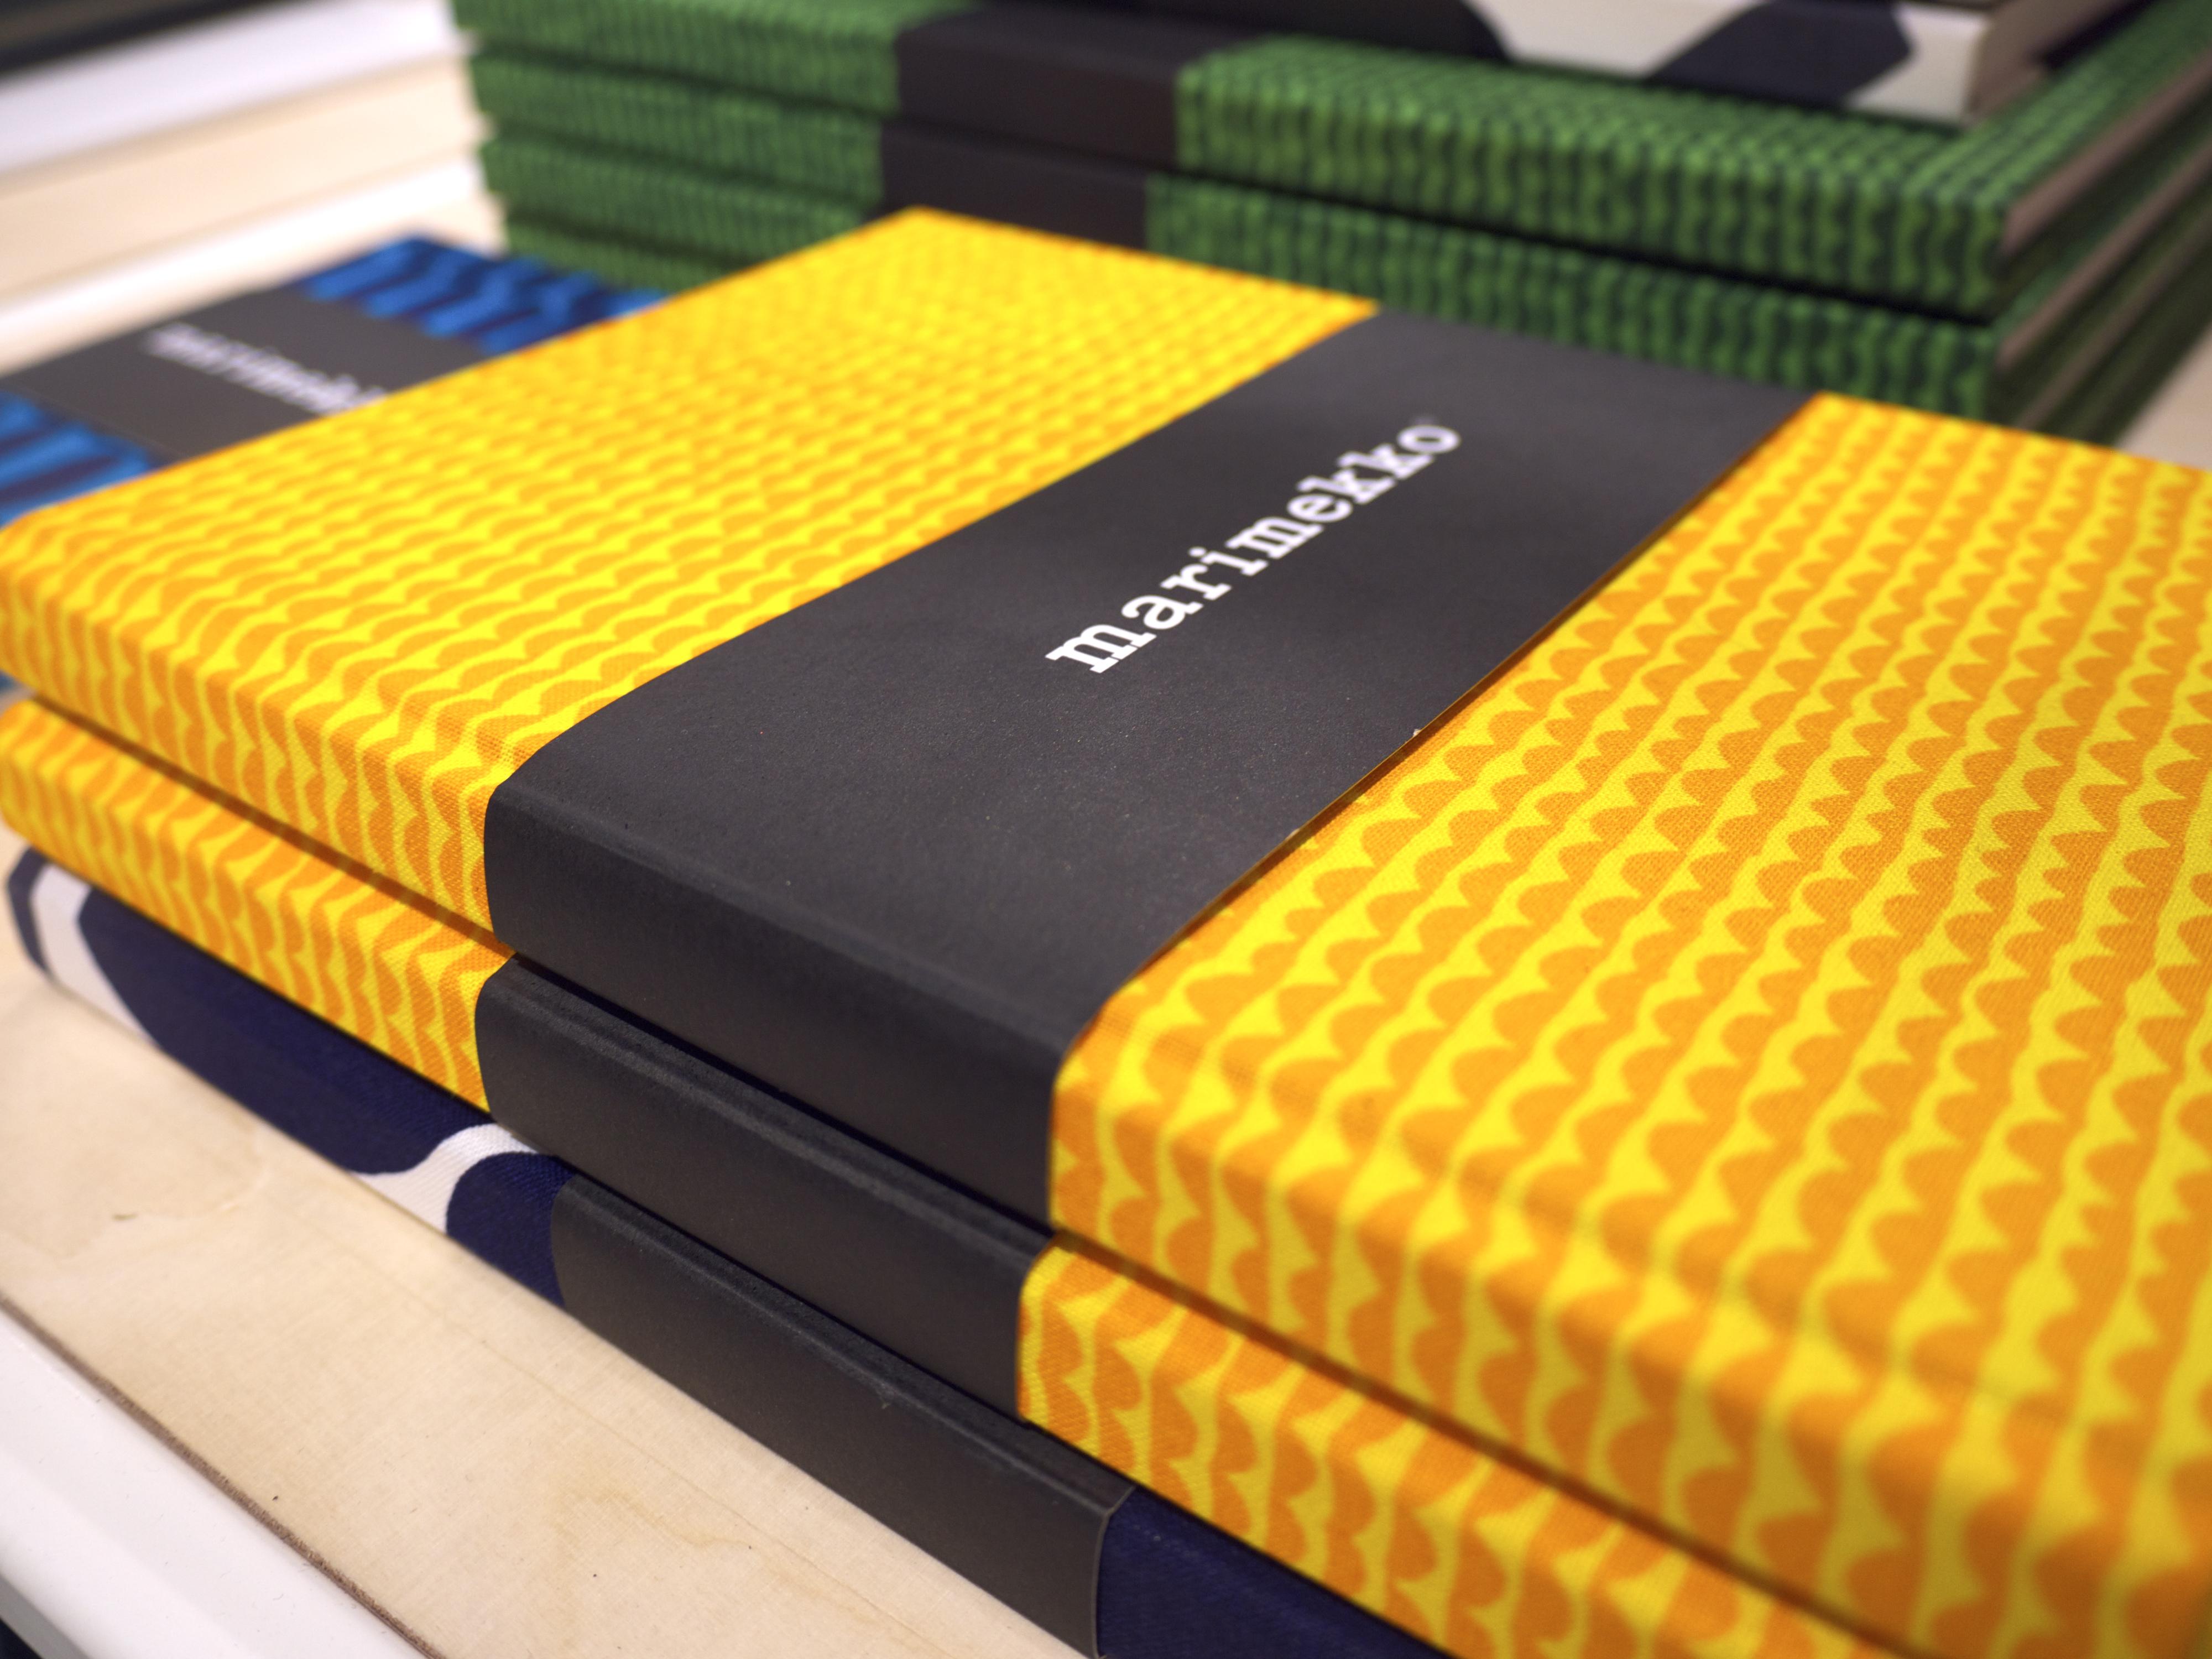 Citrus Colour - Marimekko Notebook